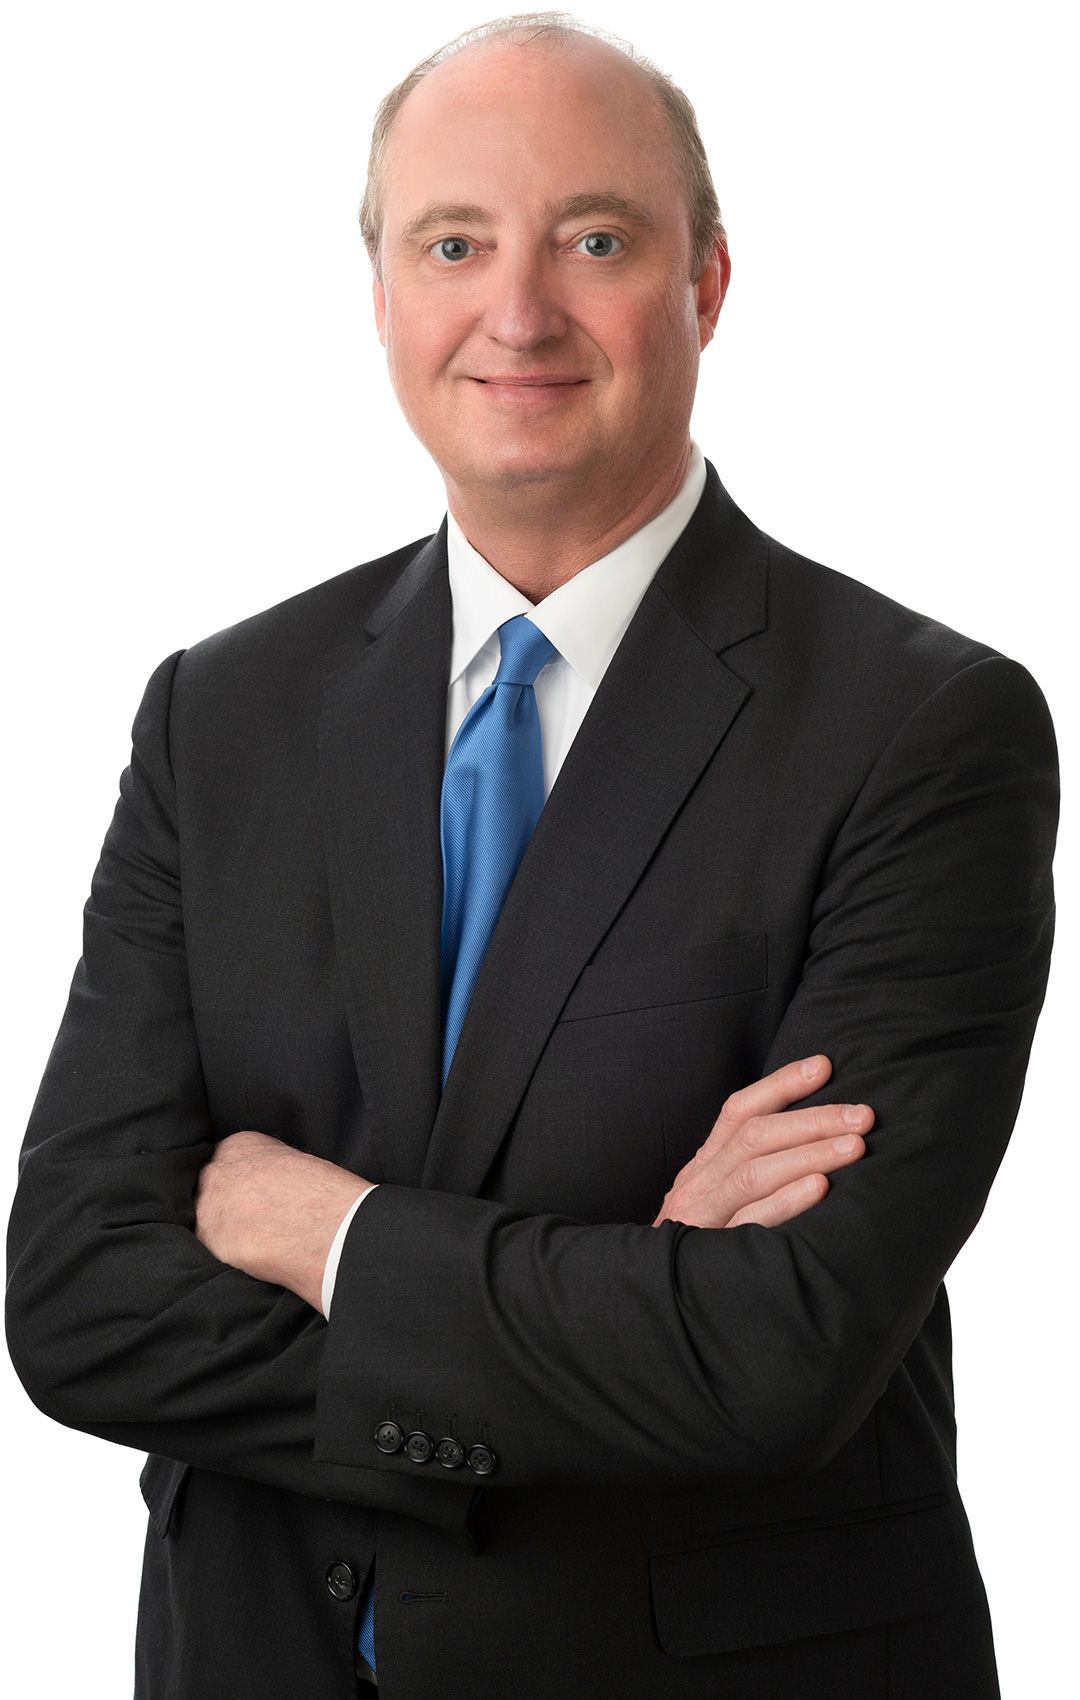 Robert H. Brunson